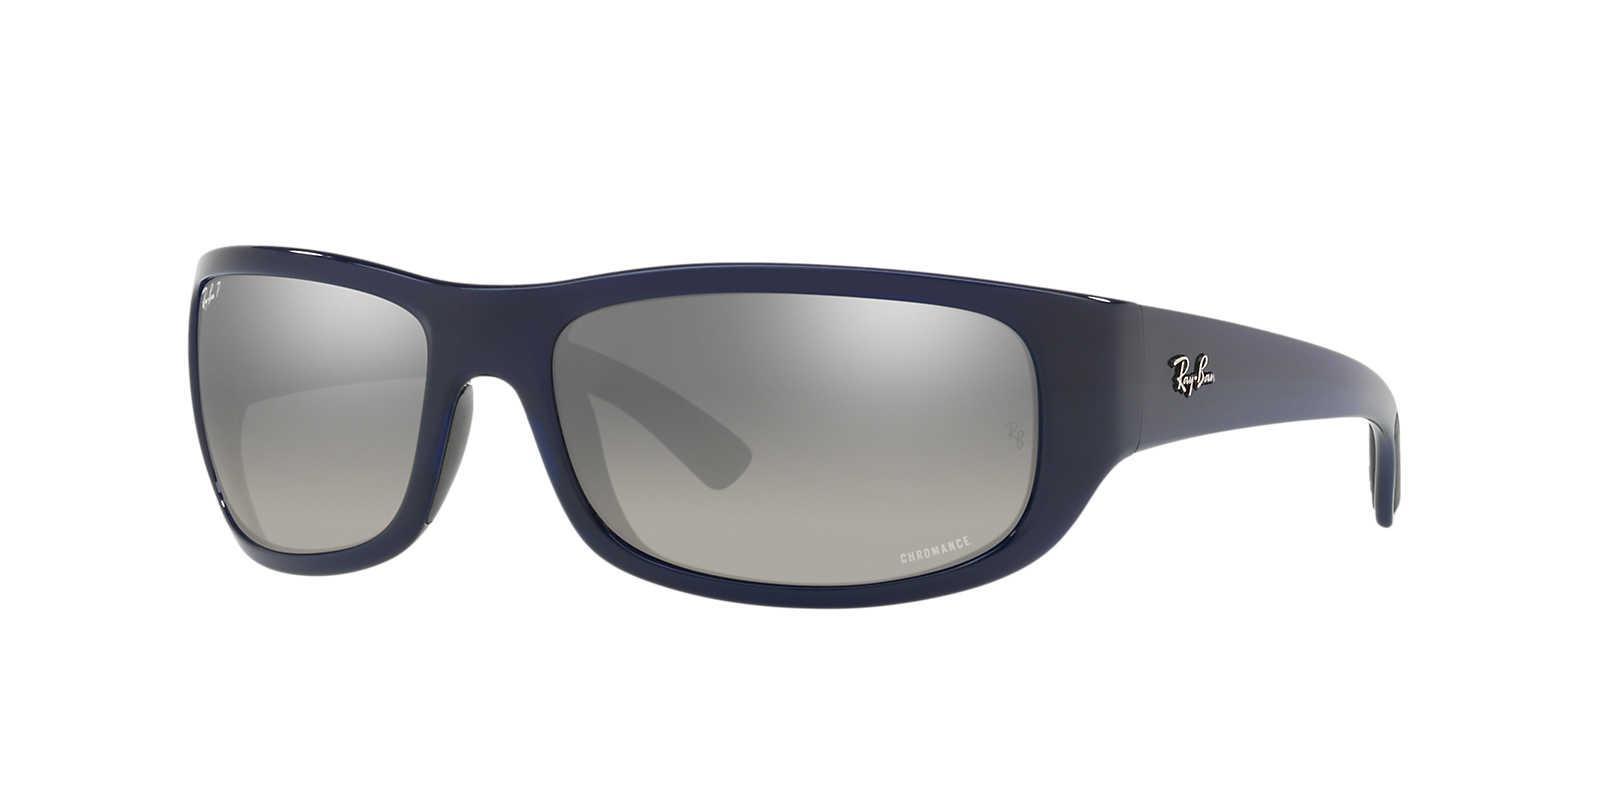 782539ebc38 Ray-Ban. Men s Gray Polarized Chromance Collection Sunglasses ...